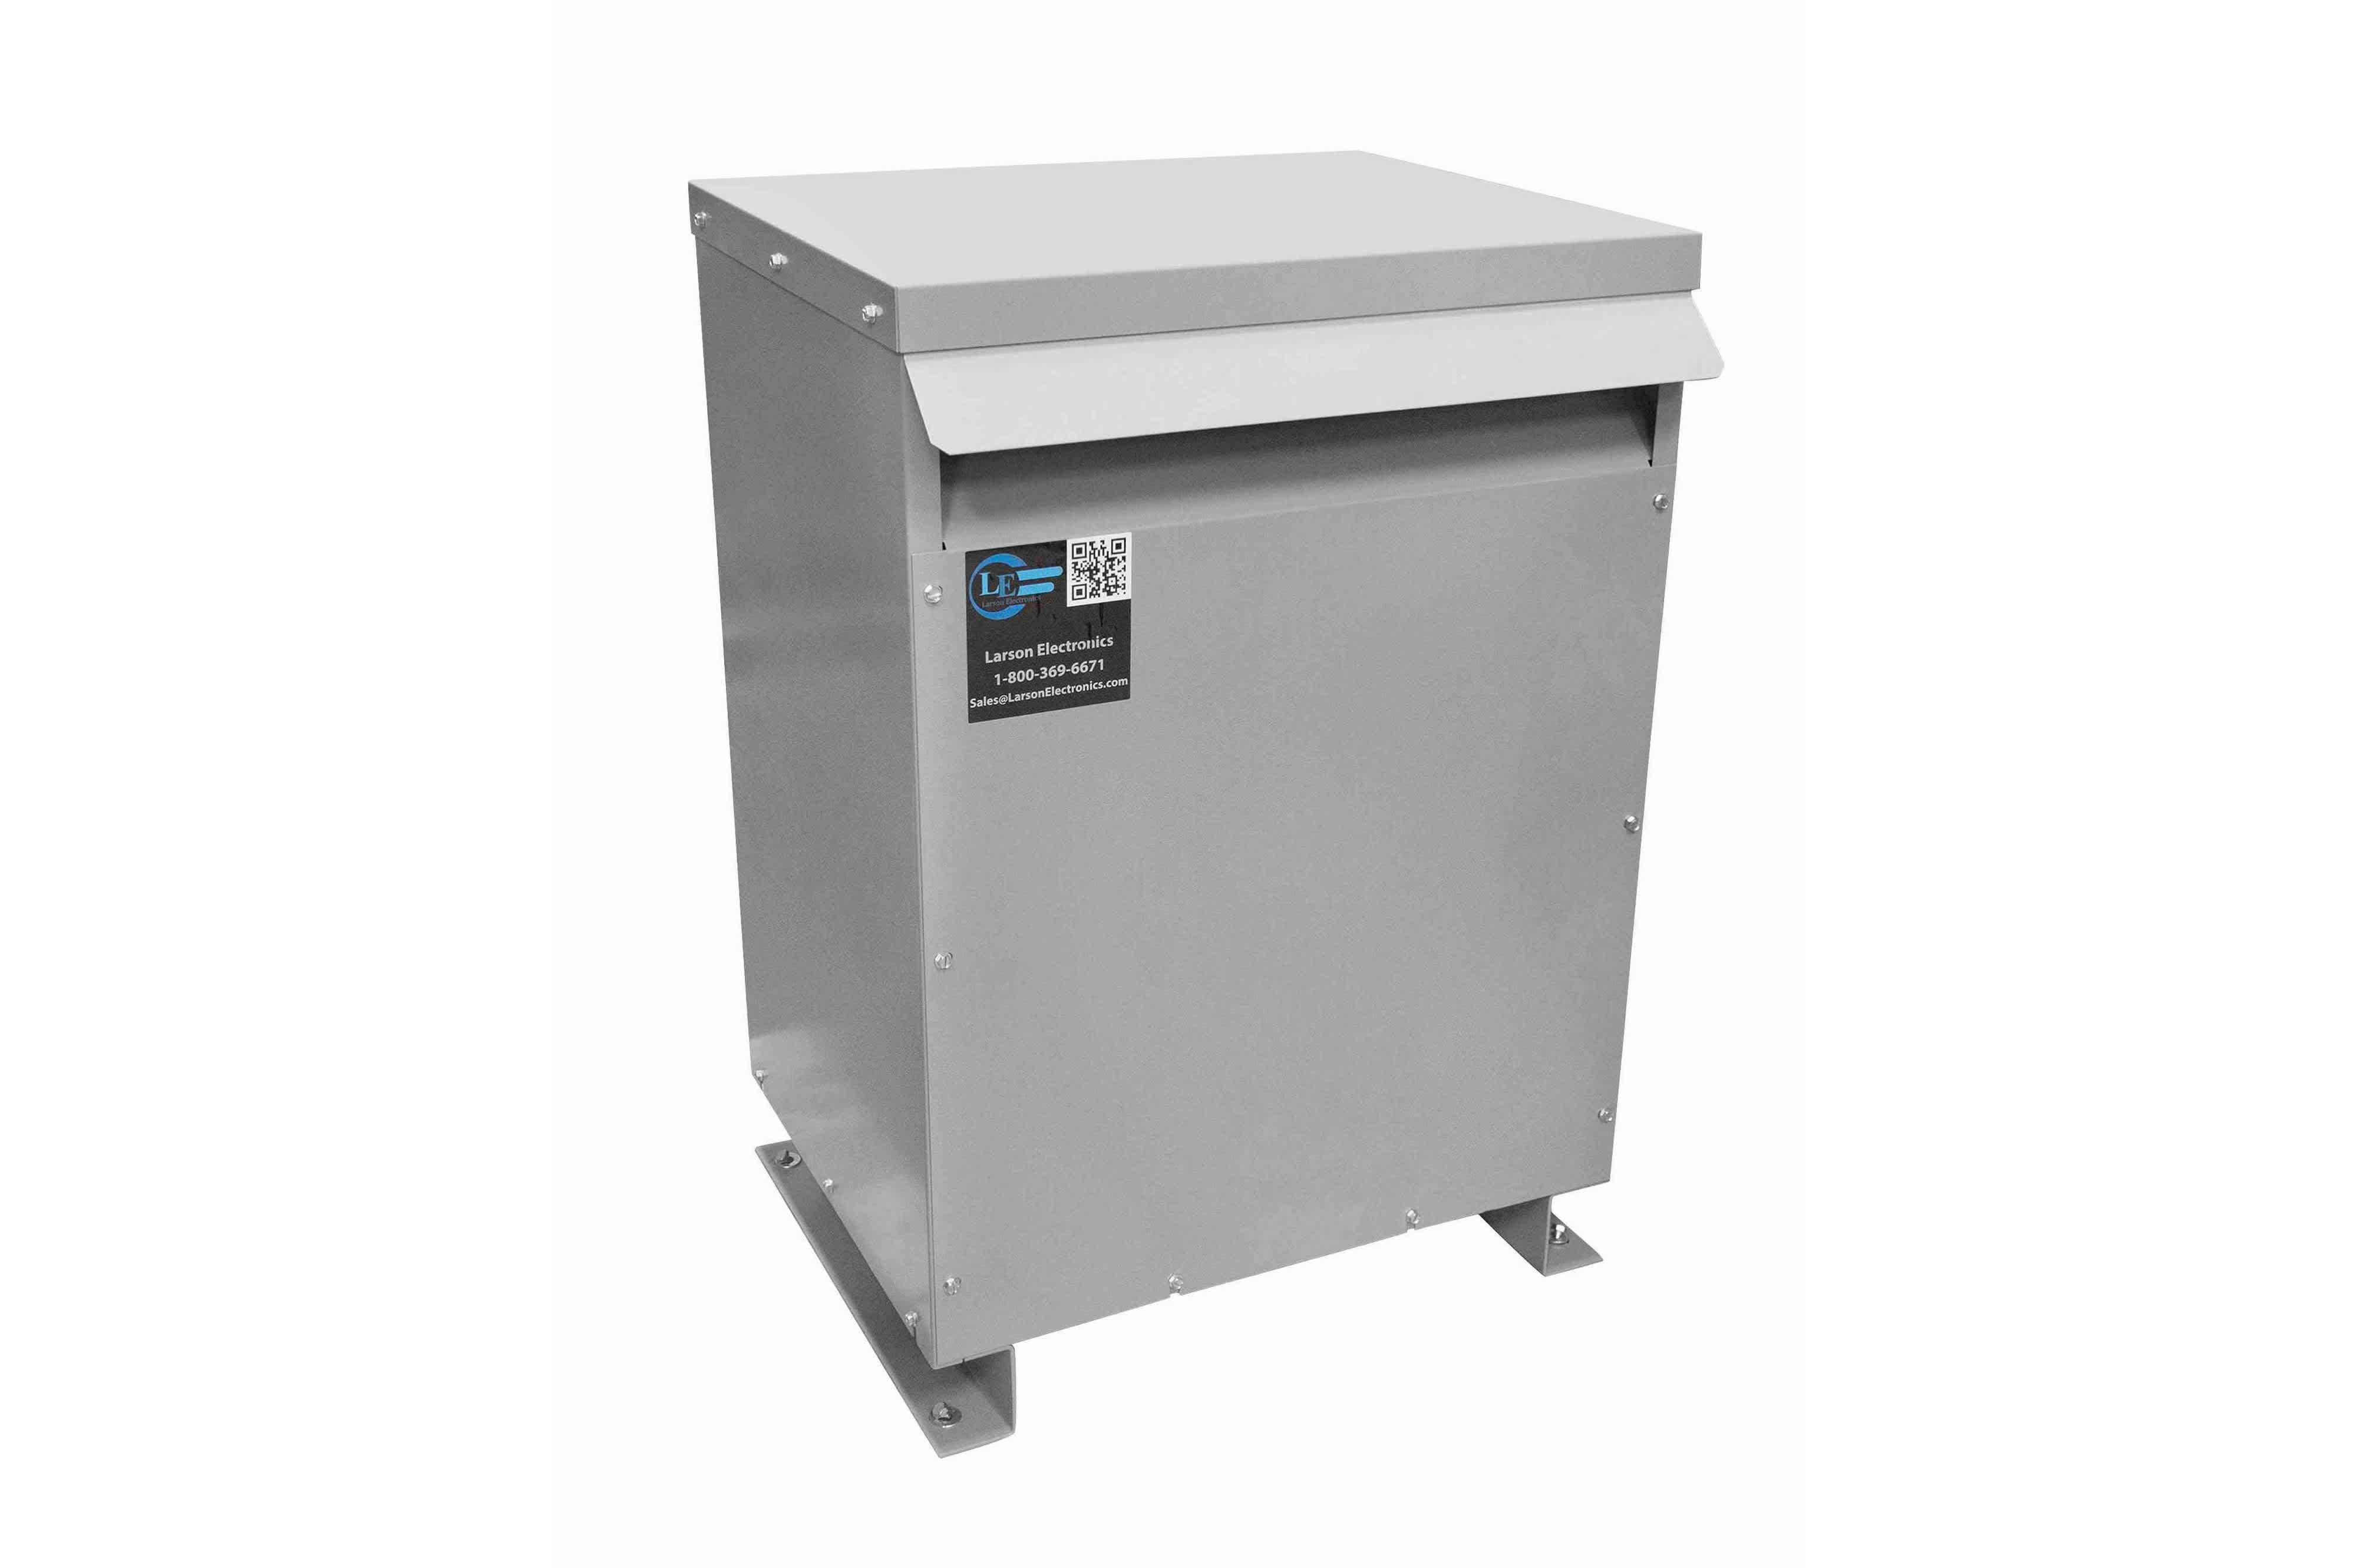 600 kVA 3PH Isolation Transformer, 600V Wye Primary, 415Y/240 Wye-N Secondary, N3R, Ventilated, 60 Hz